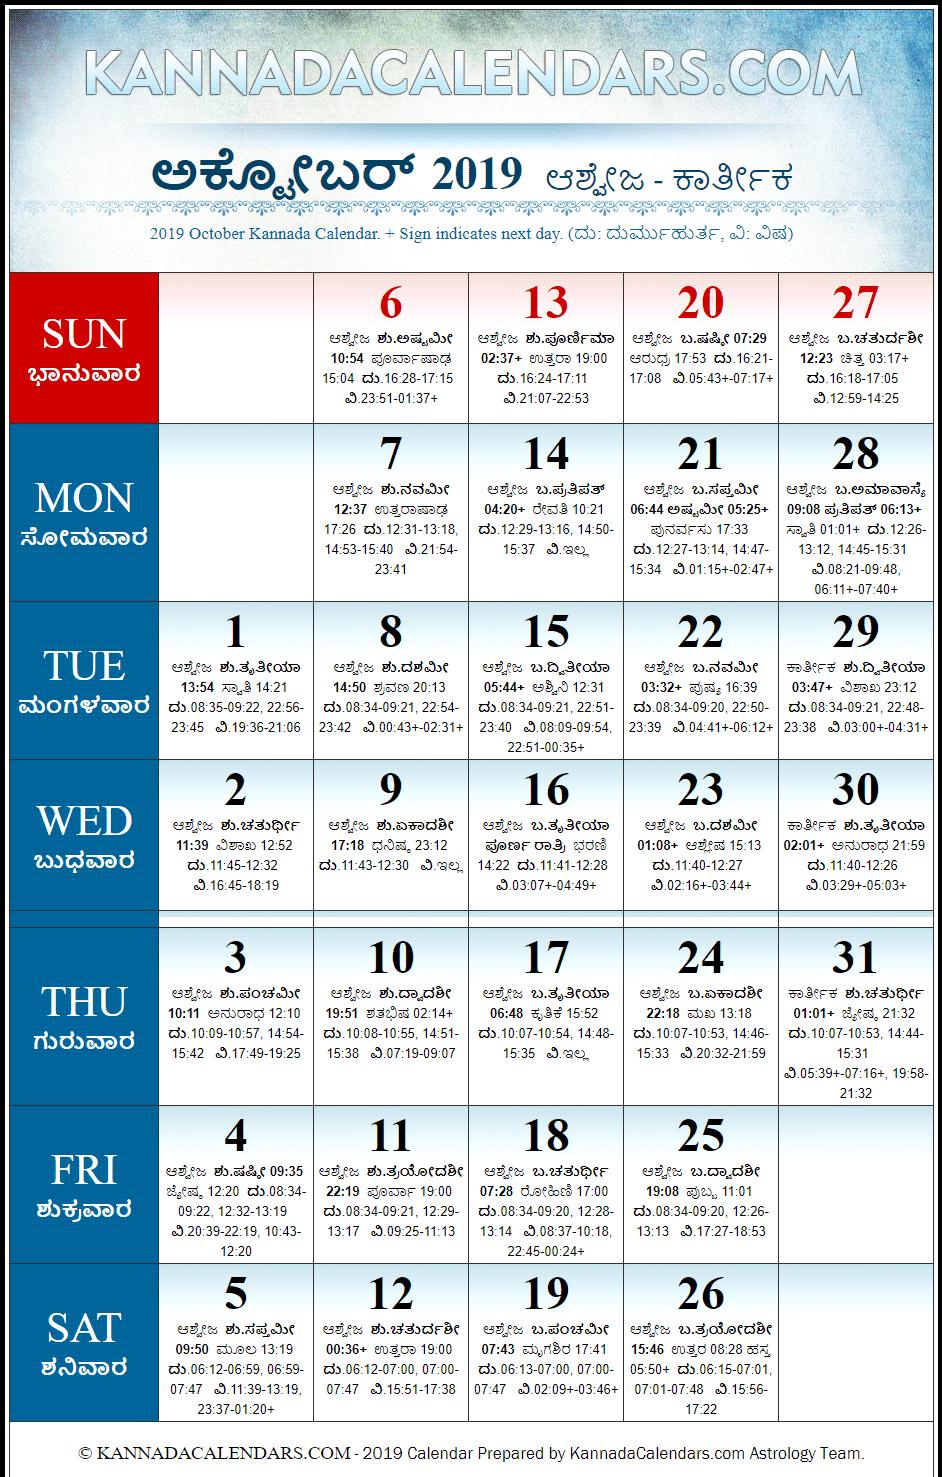 October 2019 Kannada Calendar | Hevilambi Nama Samvatsara Panchanga pertaining to Calender Of October 2019 According To Tithi